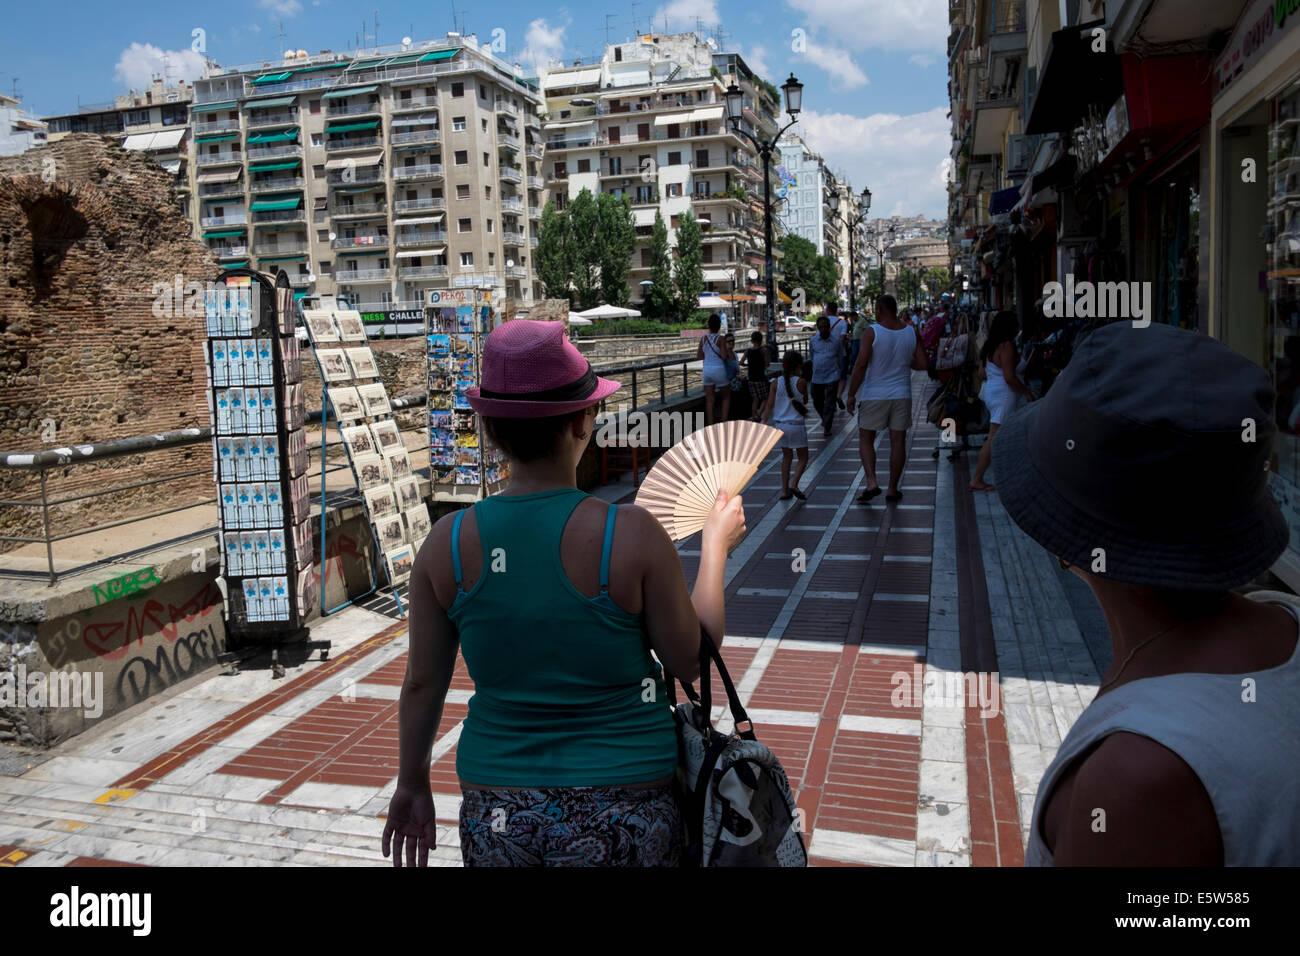 People walk at Navarinou Square in Thessaloniki, Greece on August 2014. - Stock Image